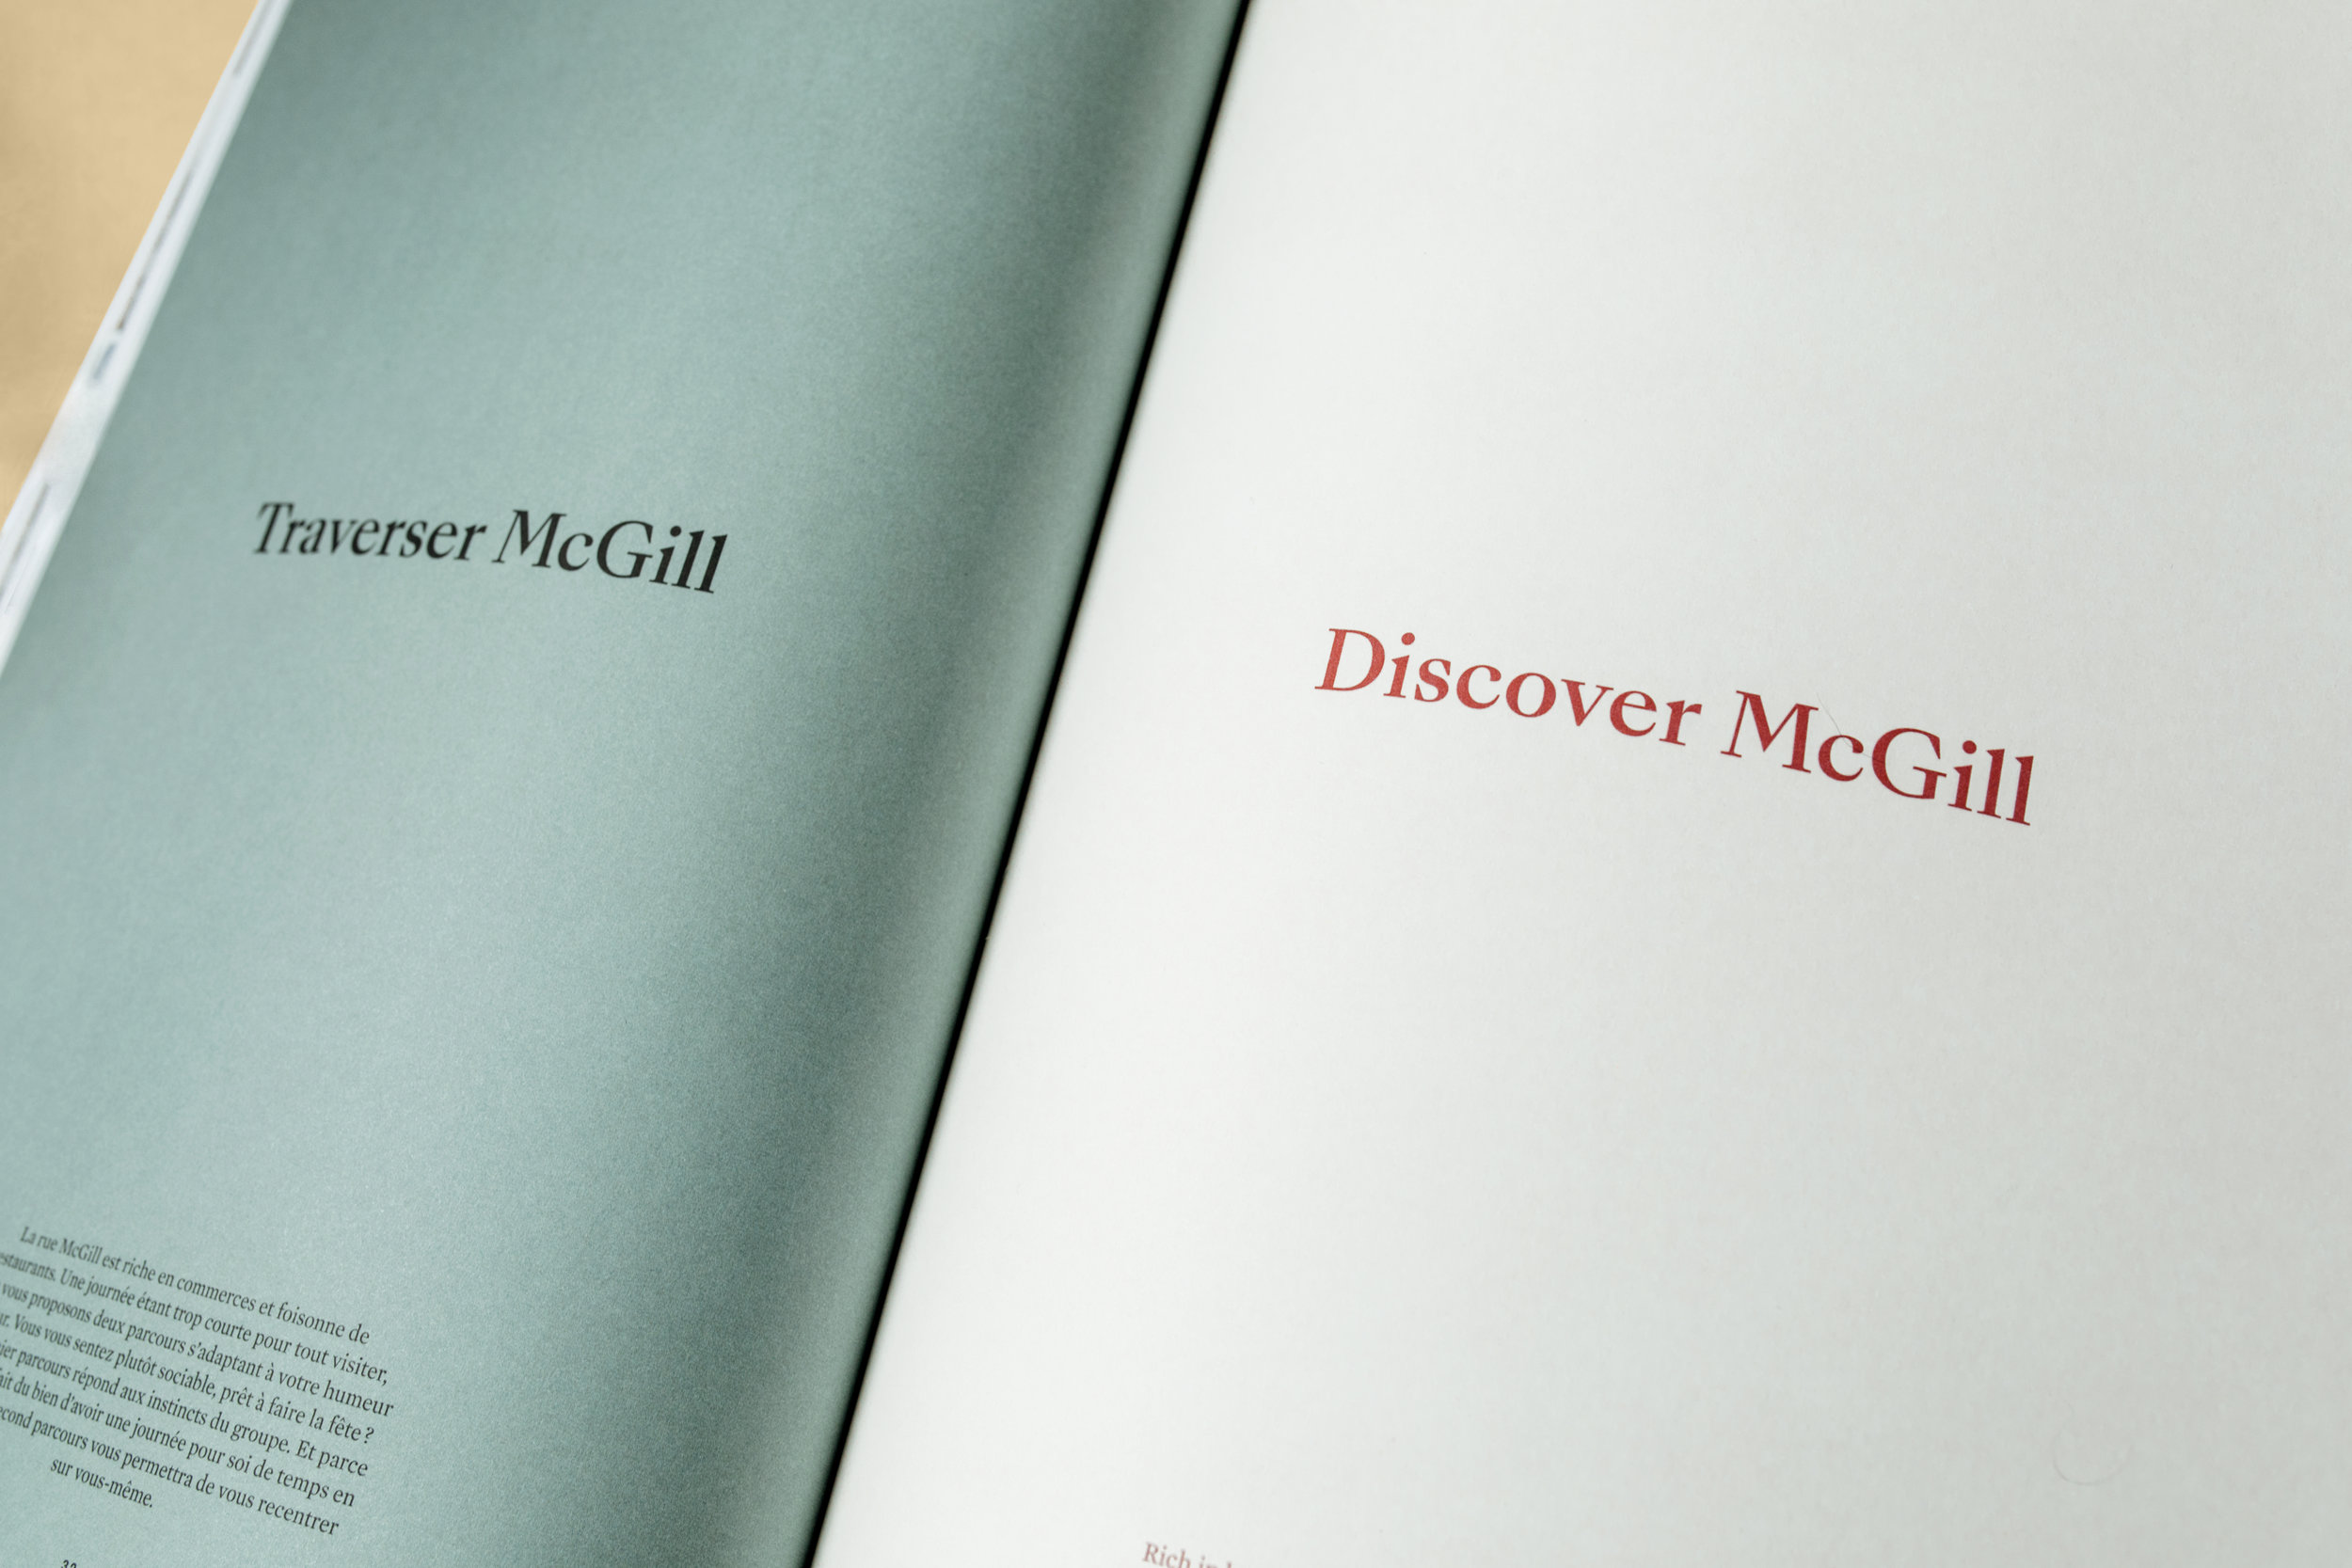 McGill_la croisee_prevel_stephanie aubin.jpg